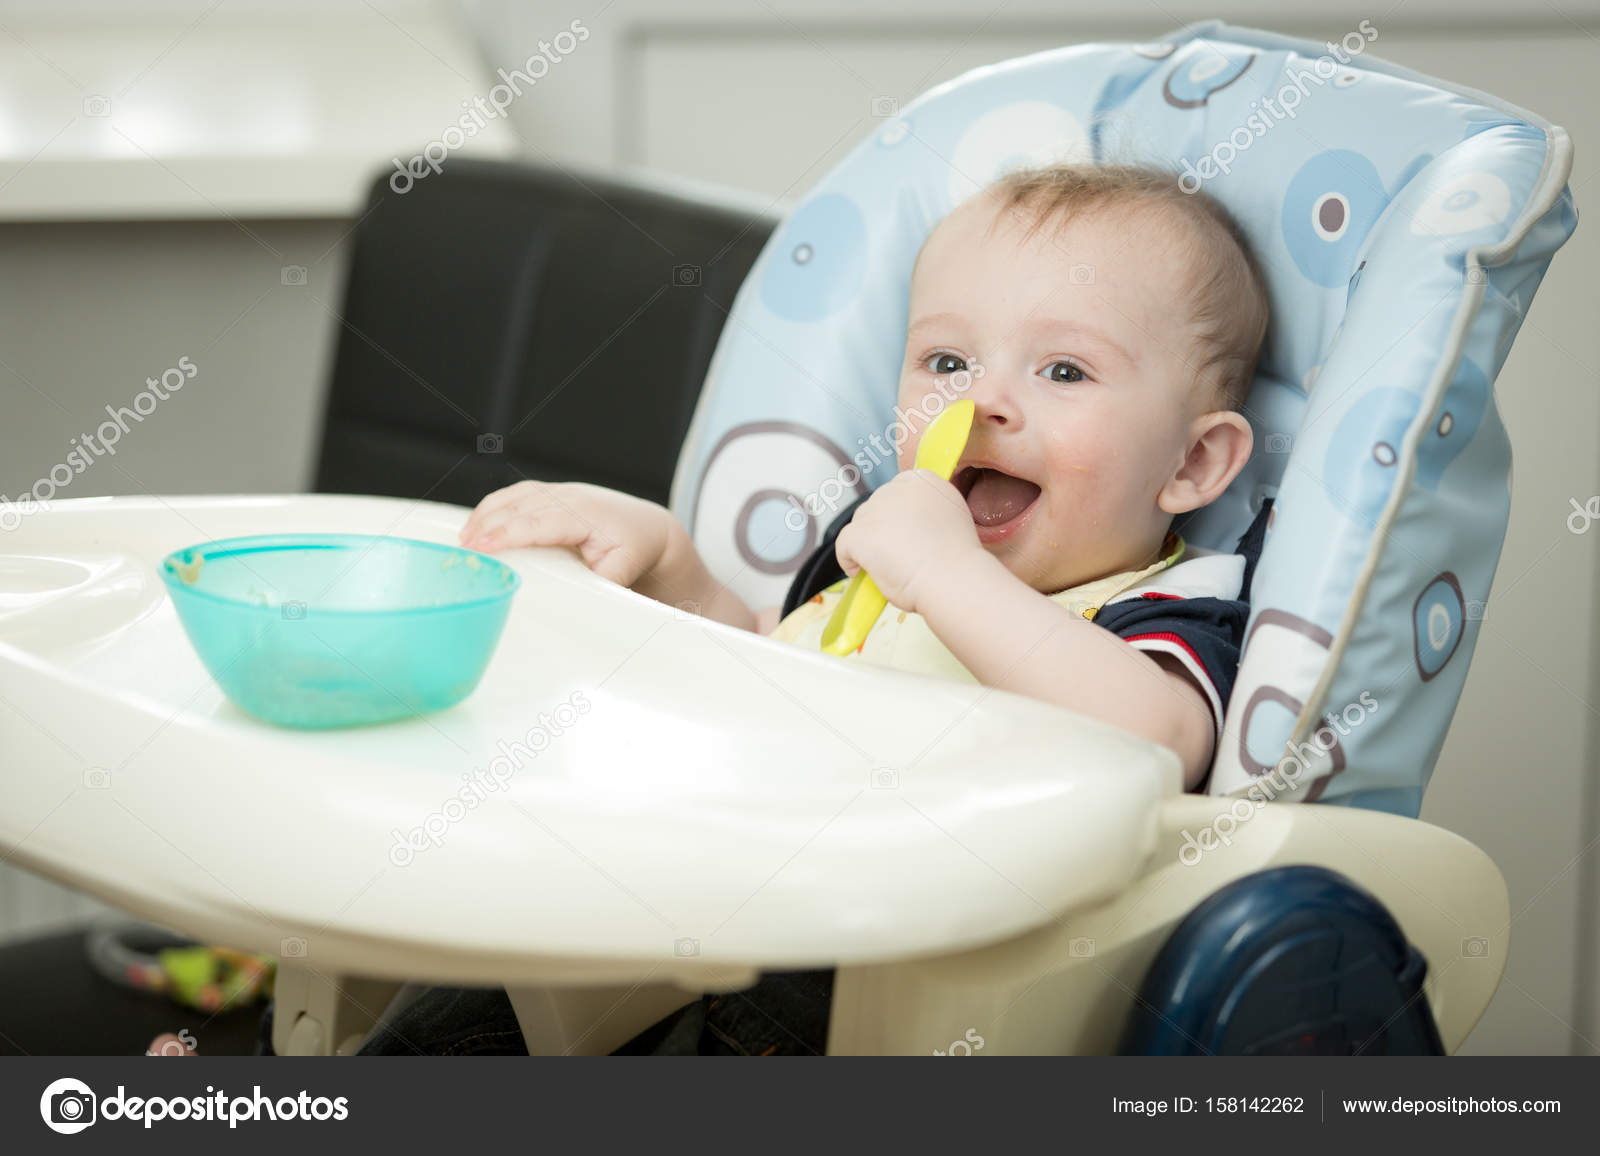 0017699f5ef Χαμογελώντας μωρό αγόρι κάθεται σε καρεκλάκι και τρώτε πληγούρι από spoo — Φωτογραφία  Αρχείου